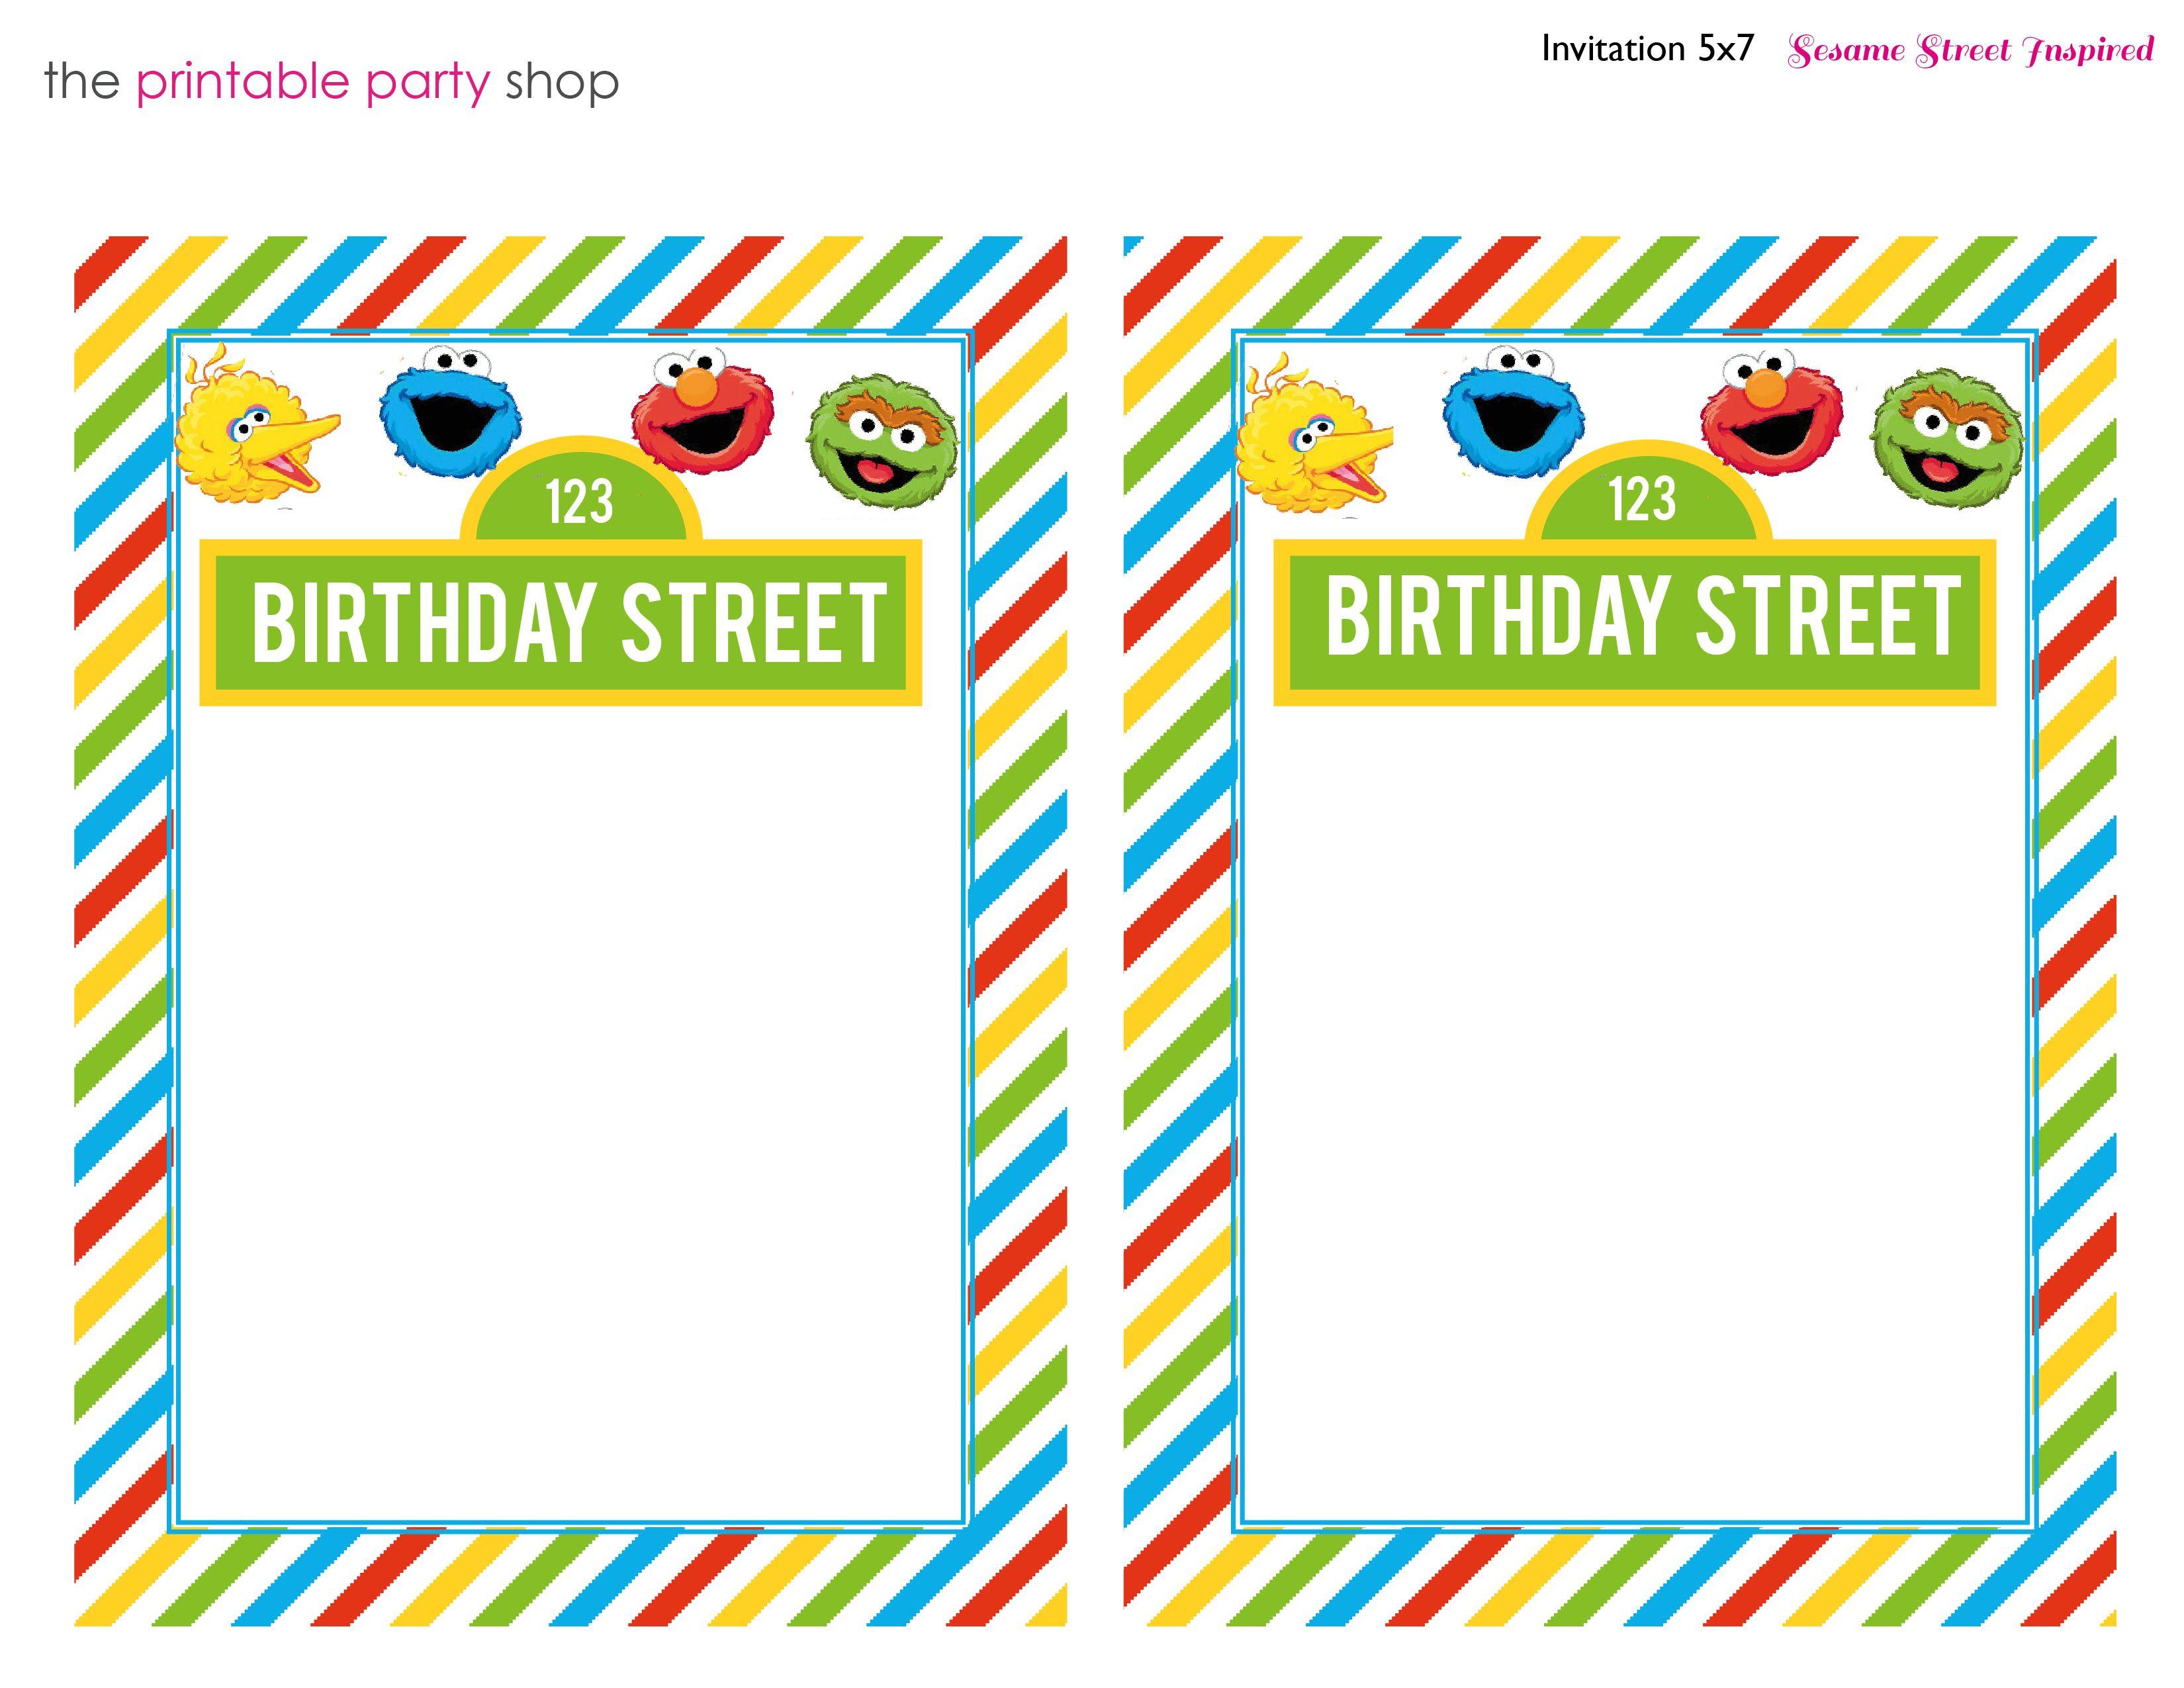 blank sesame street invitation | party ideas | pinterest | cakes, Party invitations